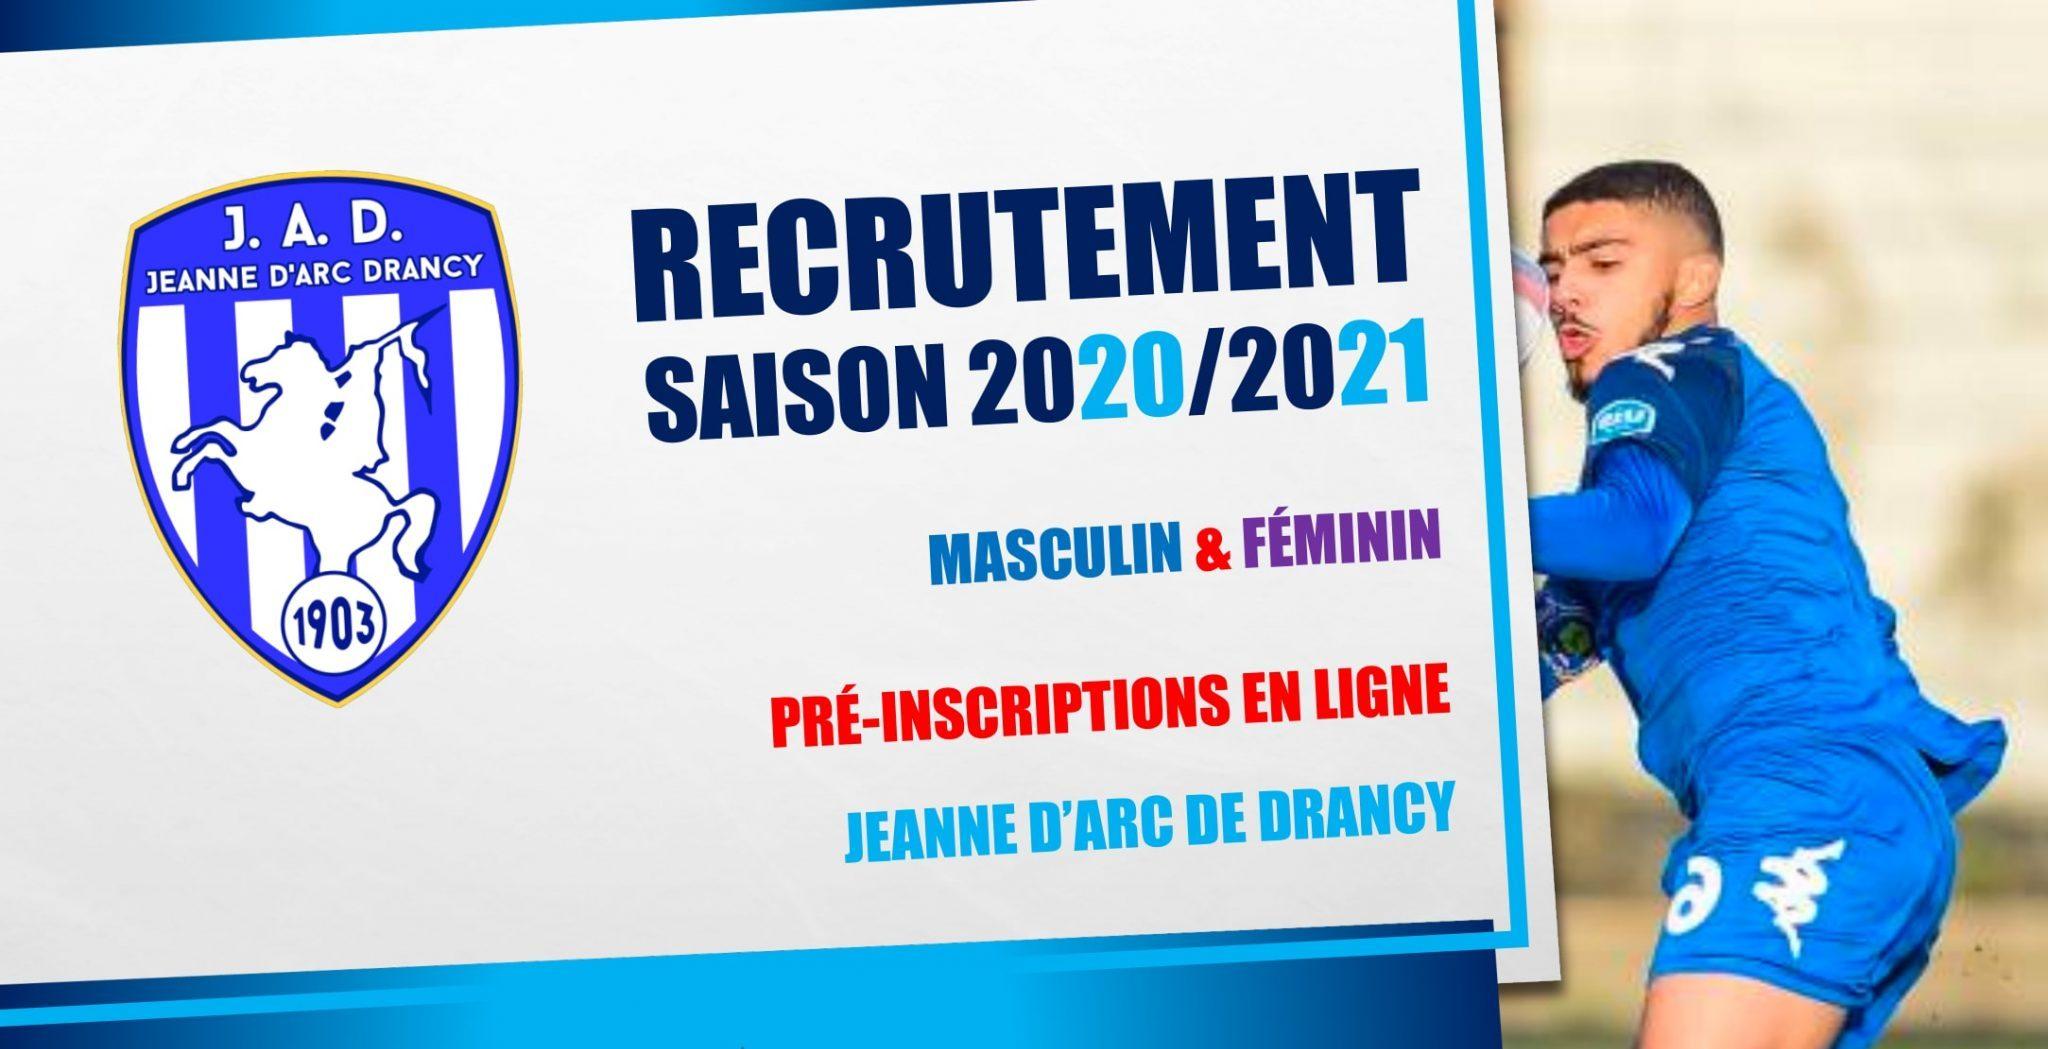 Association Sportive Jeanne D Arc Drancy J A D